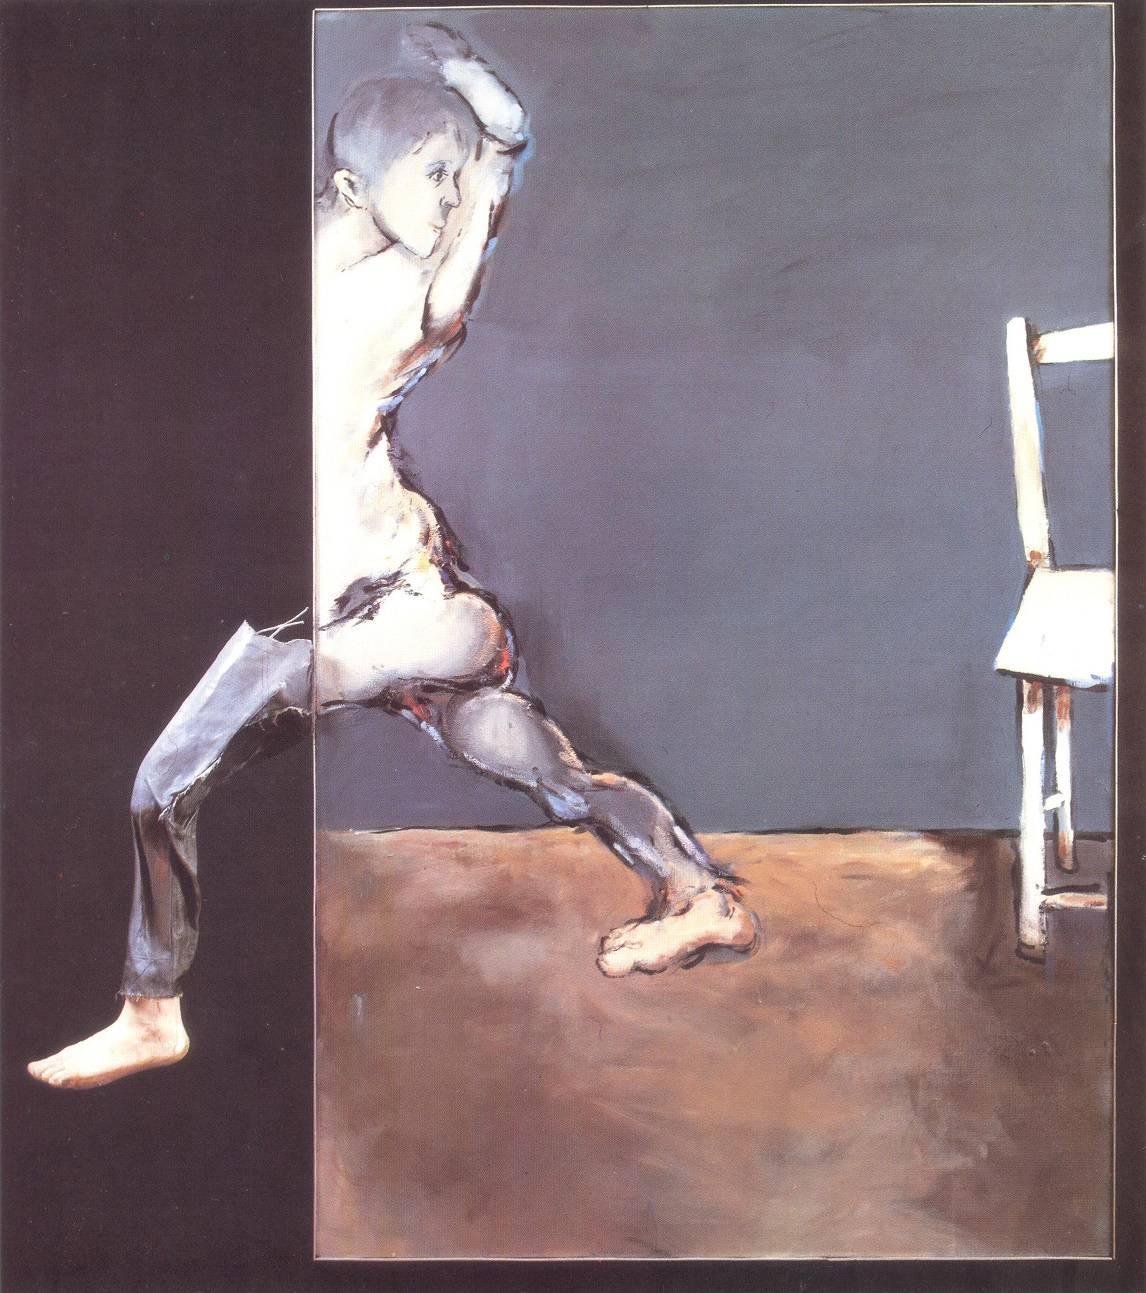 Tadeusz Kantor: Basta star seduti – esco (1988)